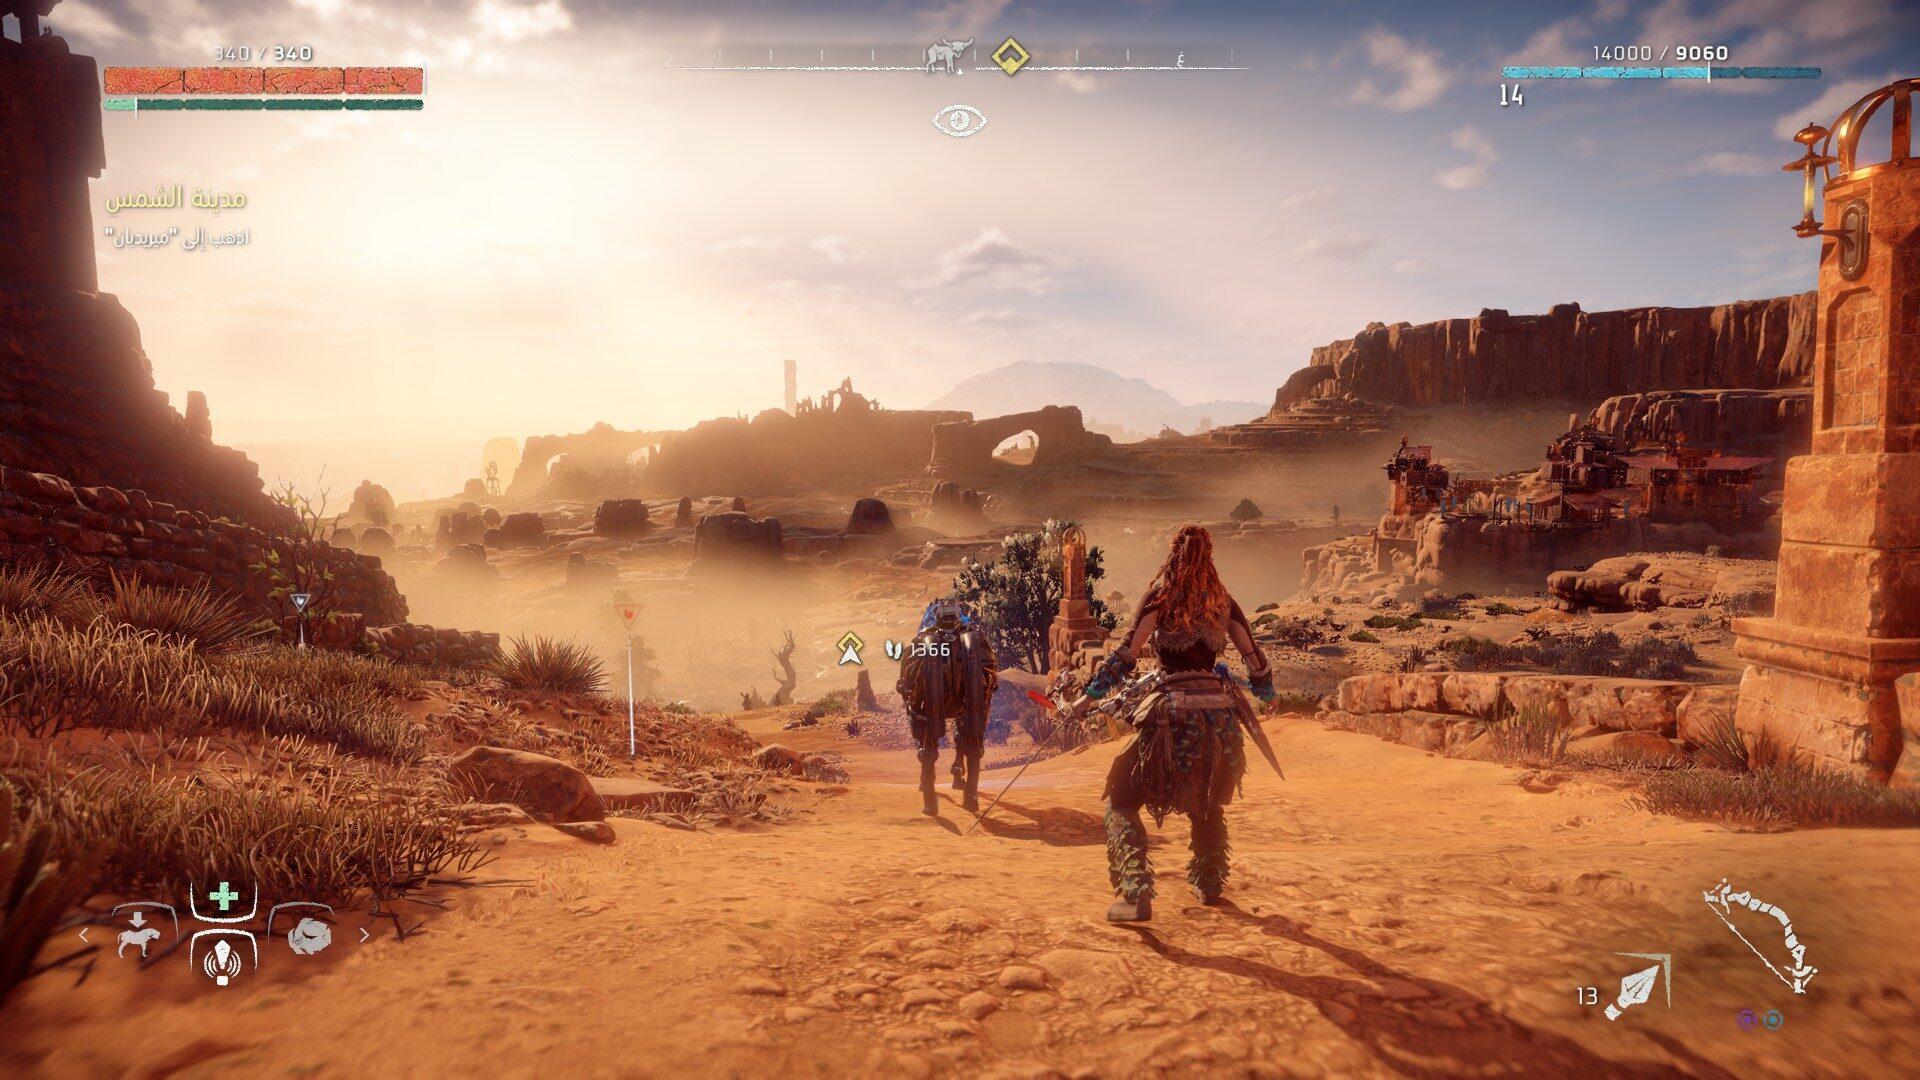 Download Horizon Zero Dawn PS4 Arabic Complete Edition Direct Links